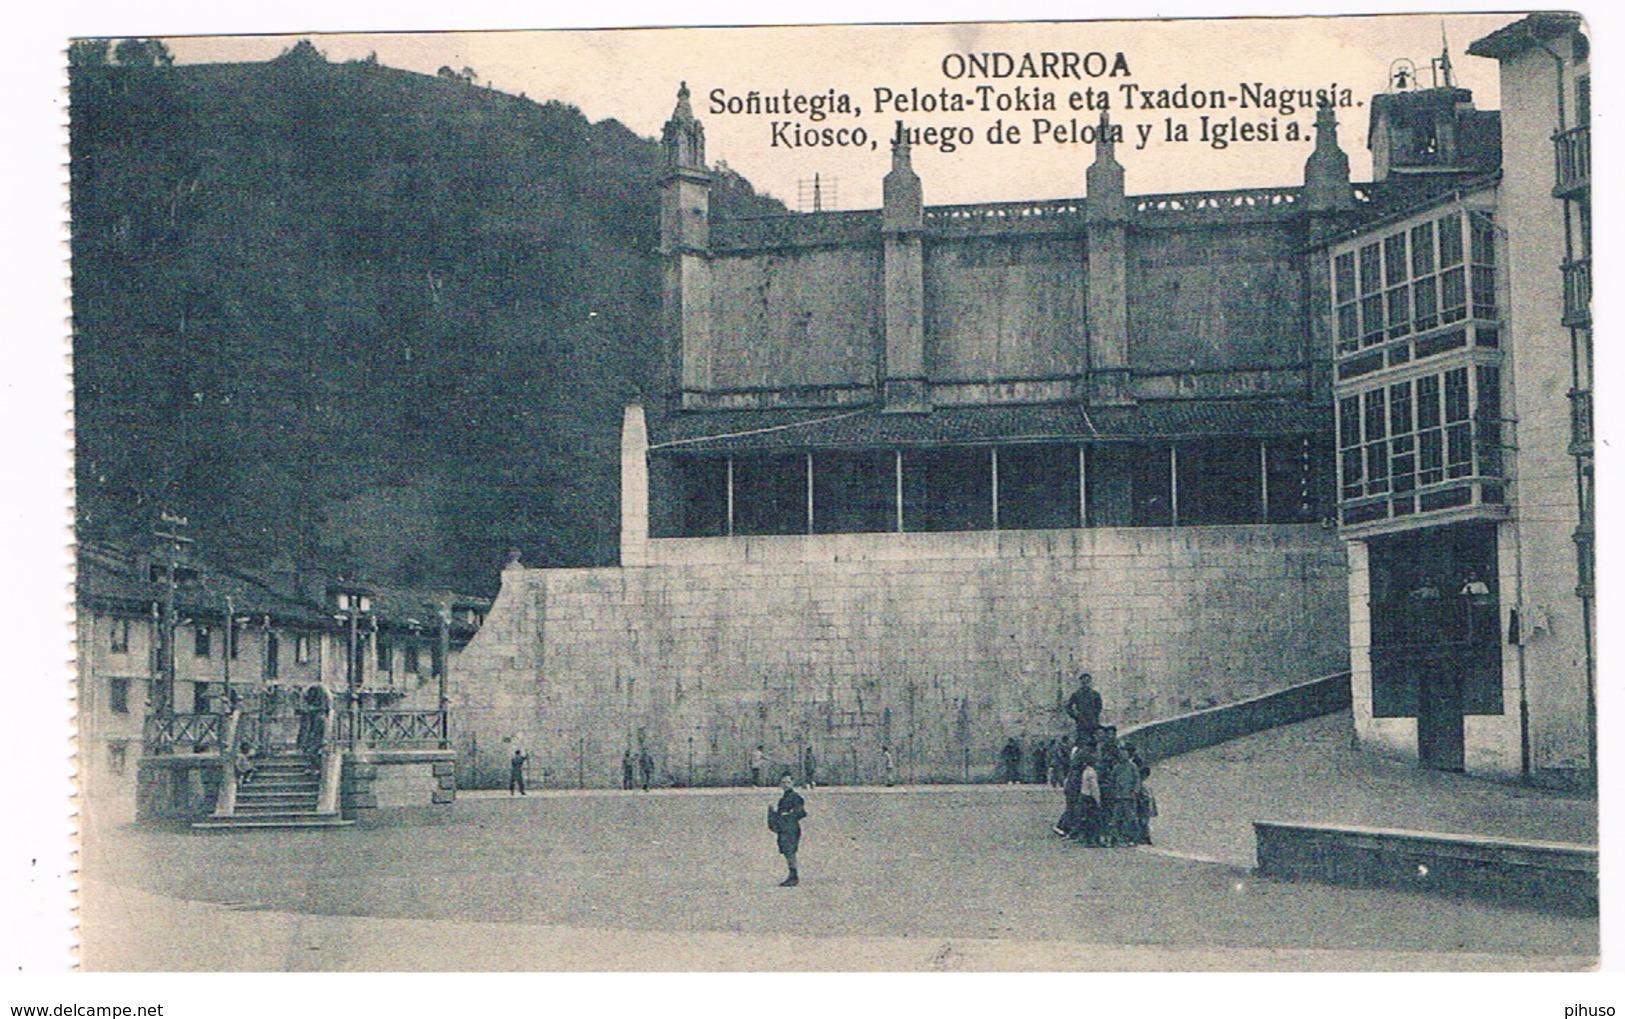 ES-1919  ONDARROA : Sofiutegia, Pelota-Tokiaeta Txadon=Nagusia - Spain